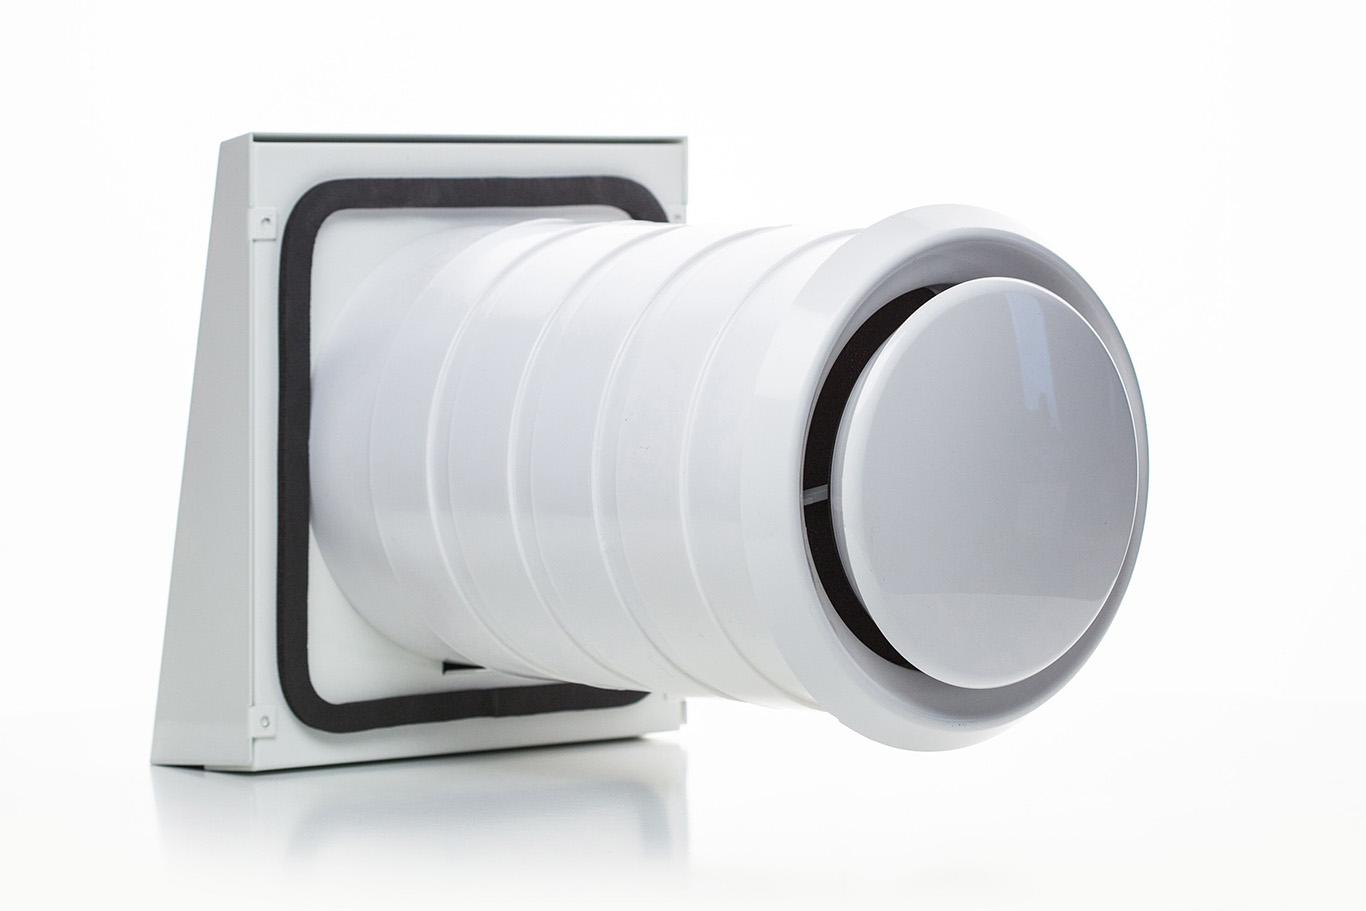 Ventoxx Comfort rekuperators impulsa vadība keramiskais siltuma akumulators 300mm